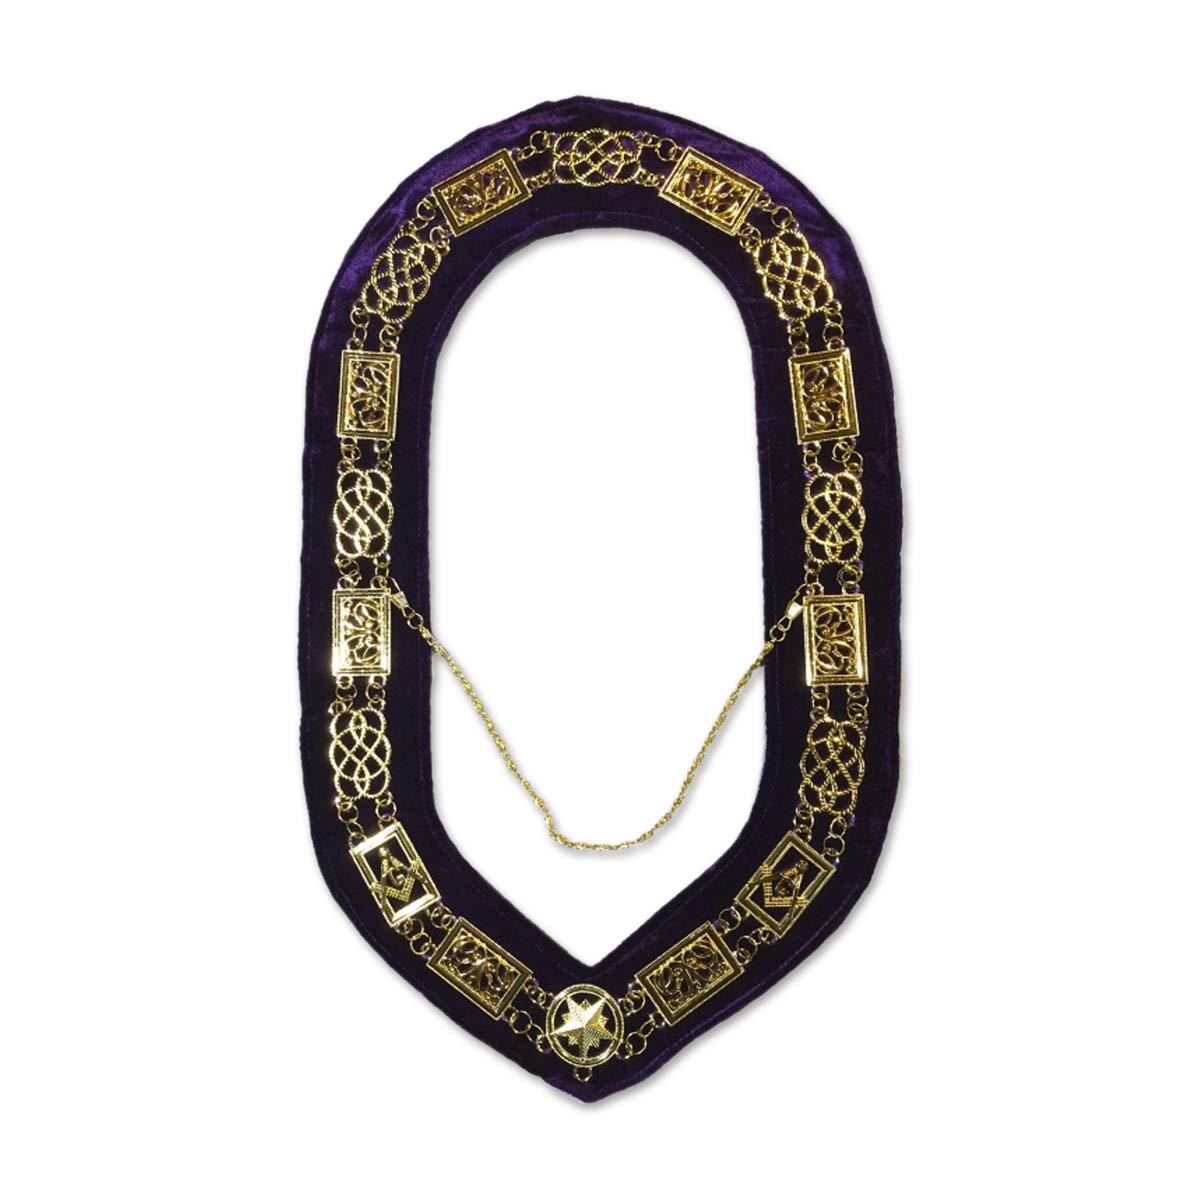 gold Grand Lodge Masonic Chain Collar with Purple Velvet